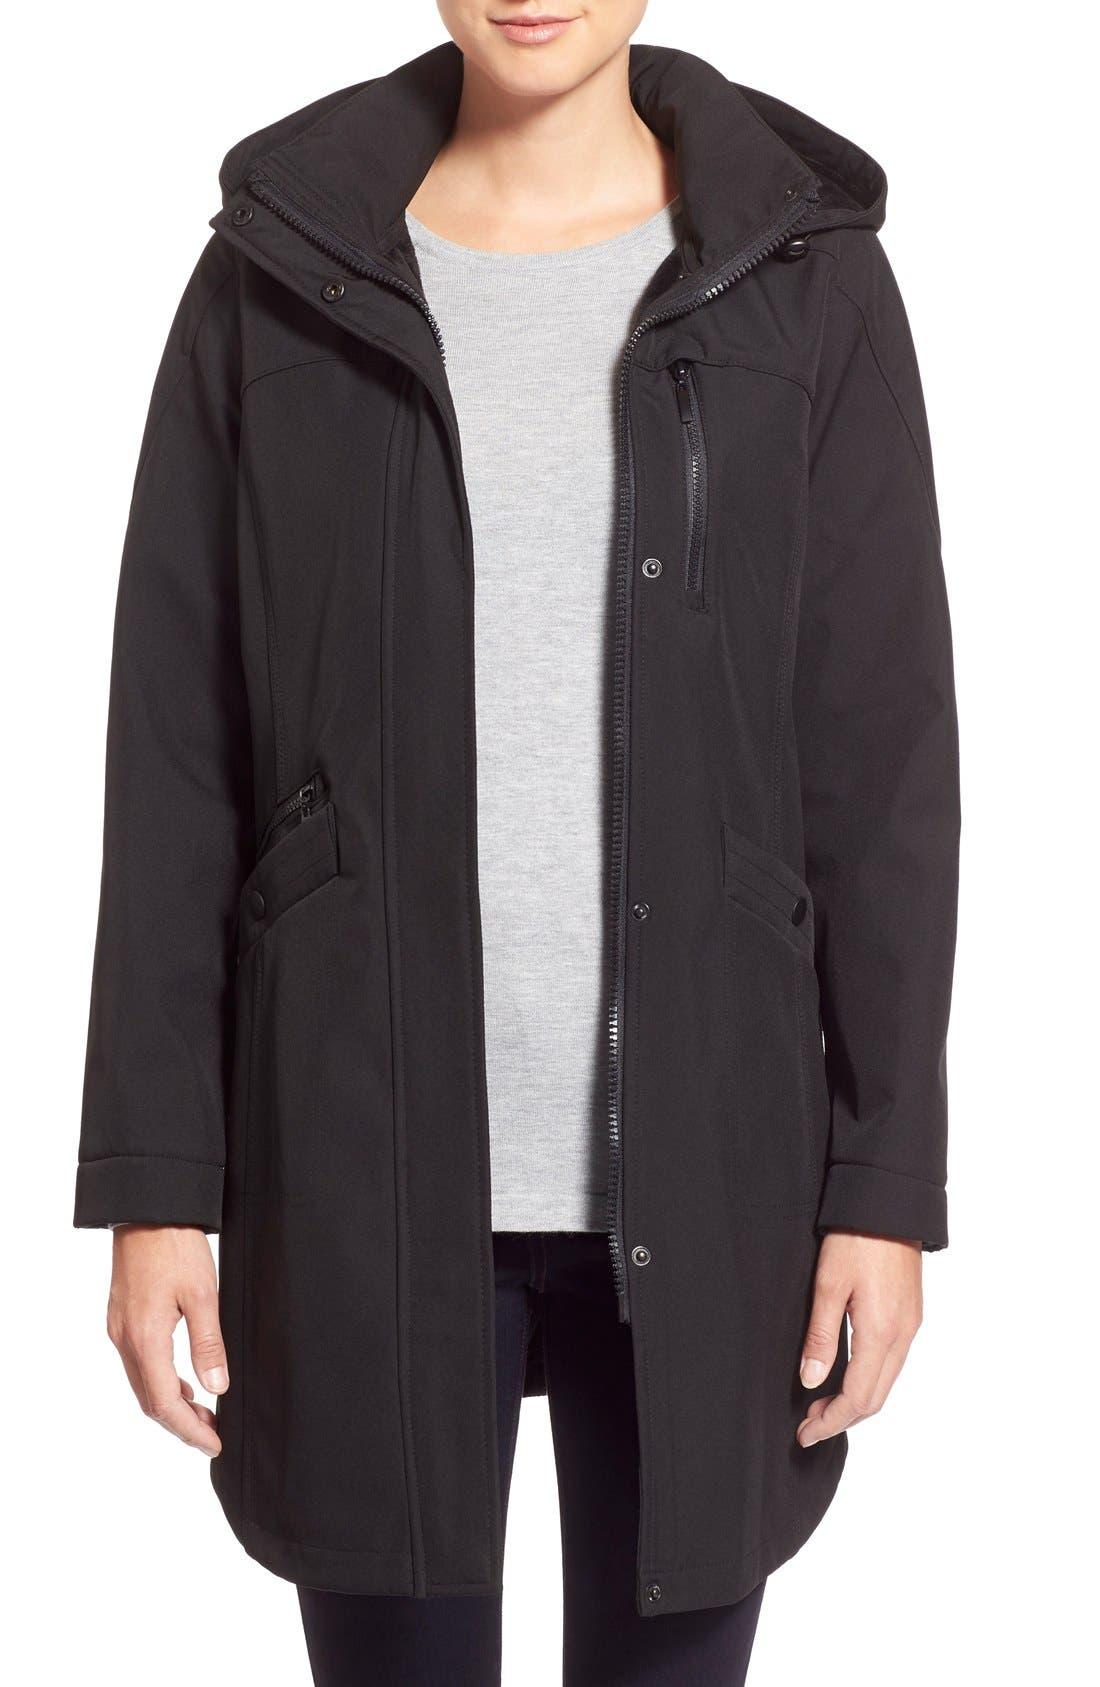 KRISTEN BLAKE Crossdye Hooded Soft Shell Jacket